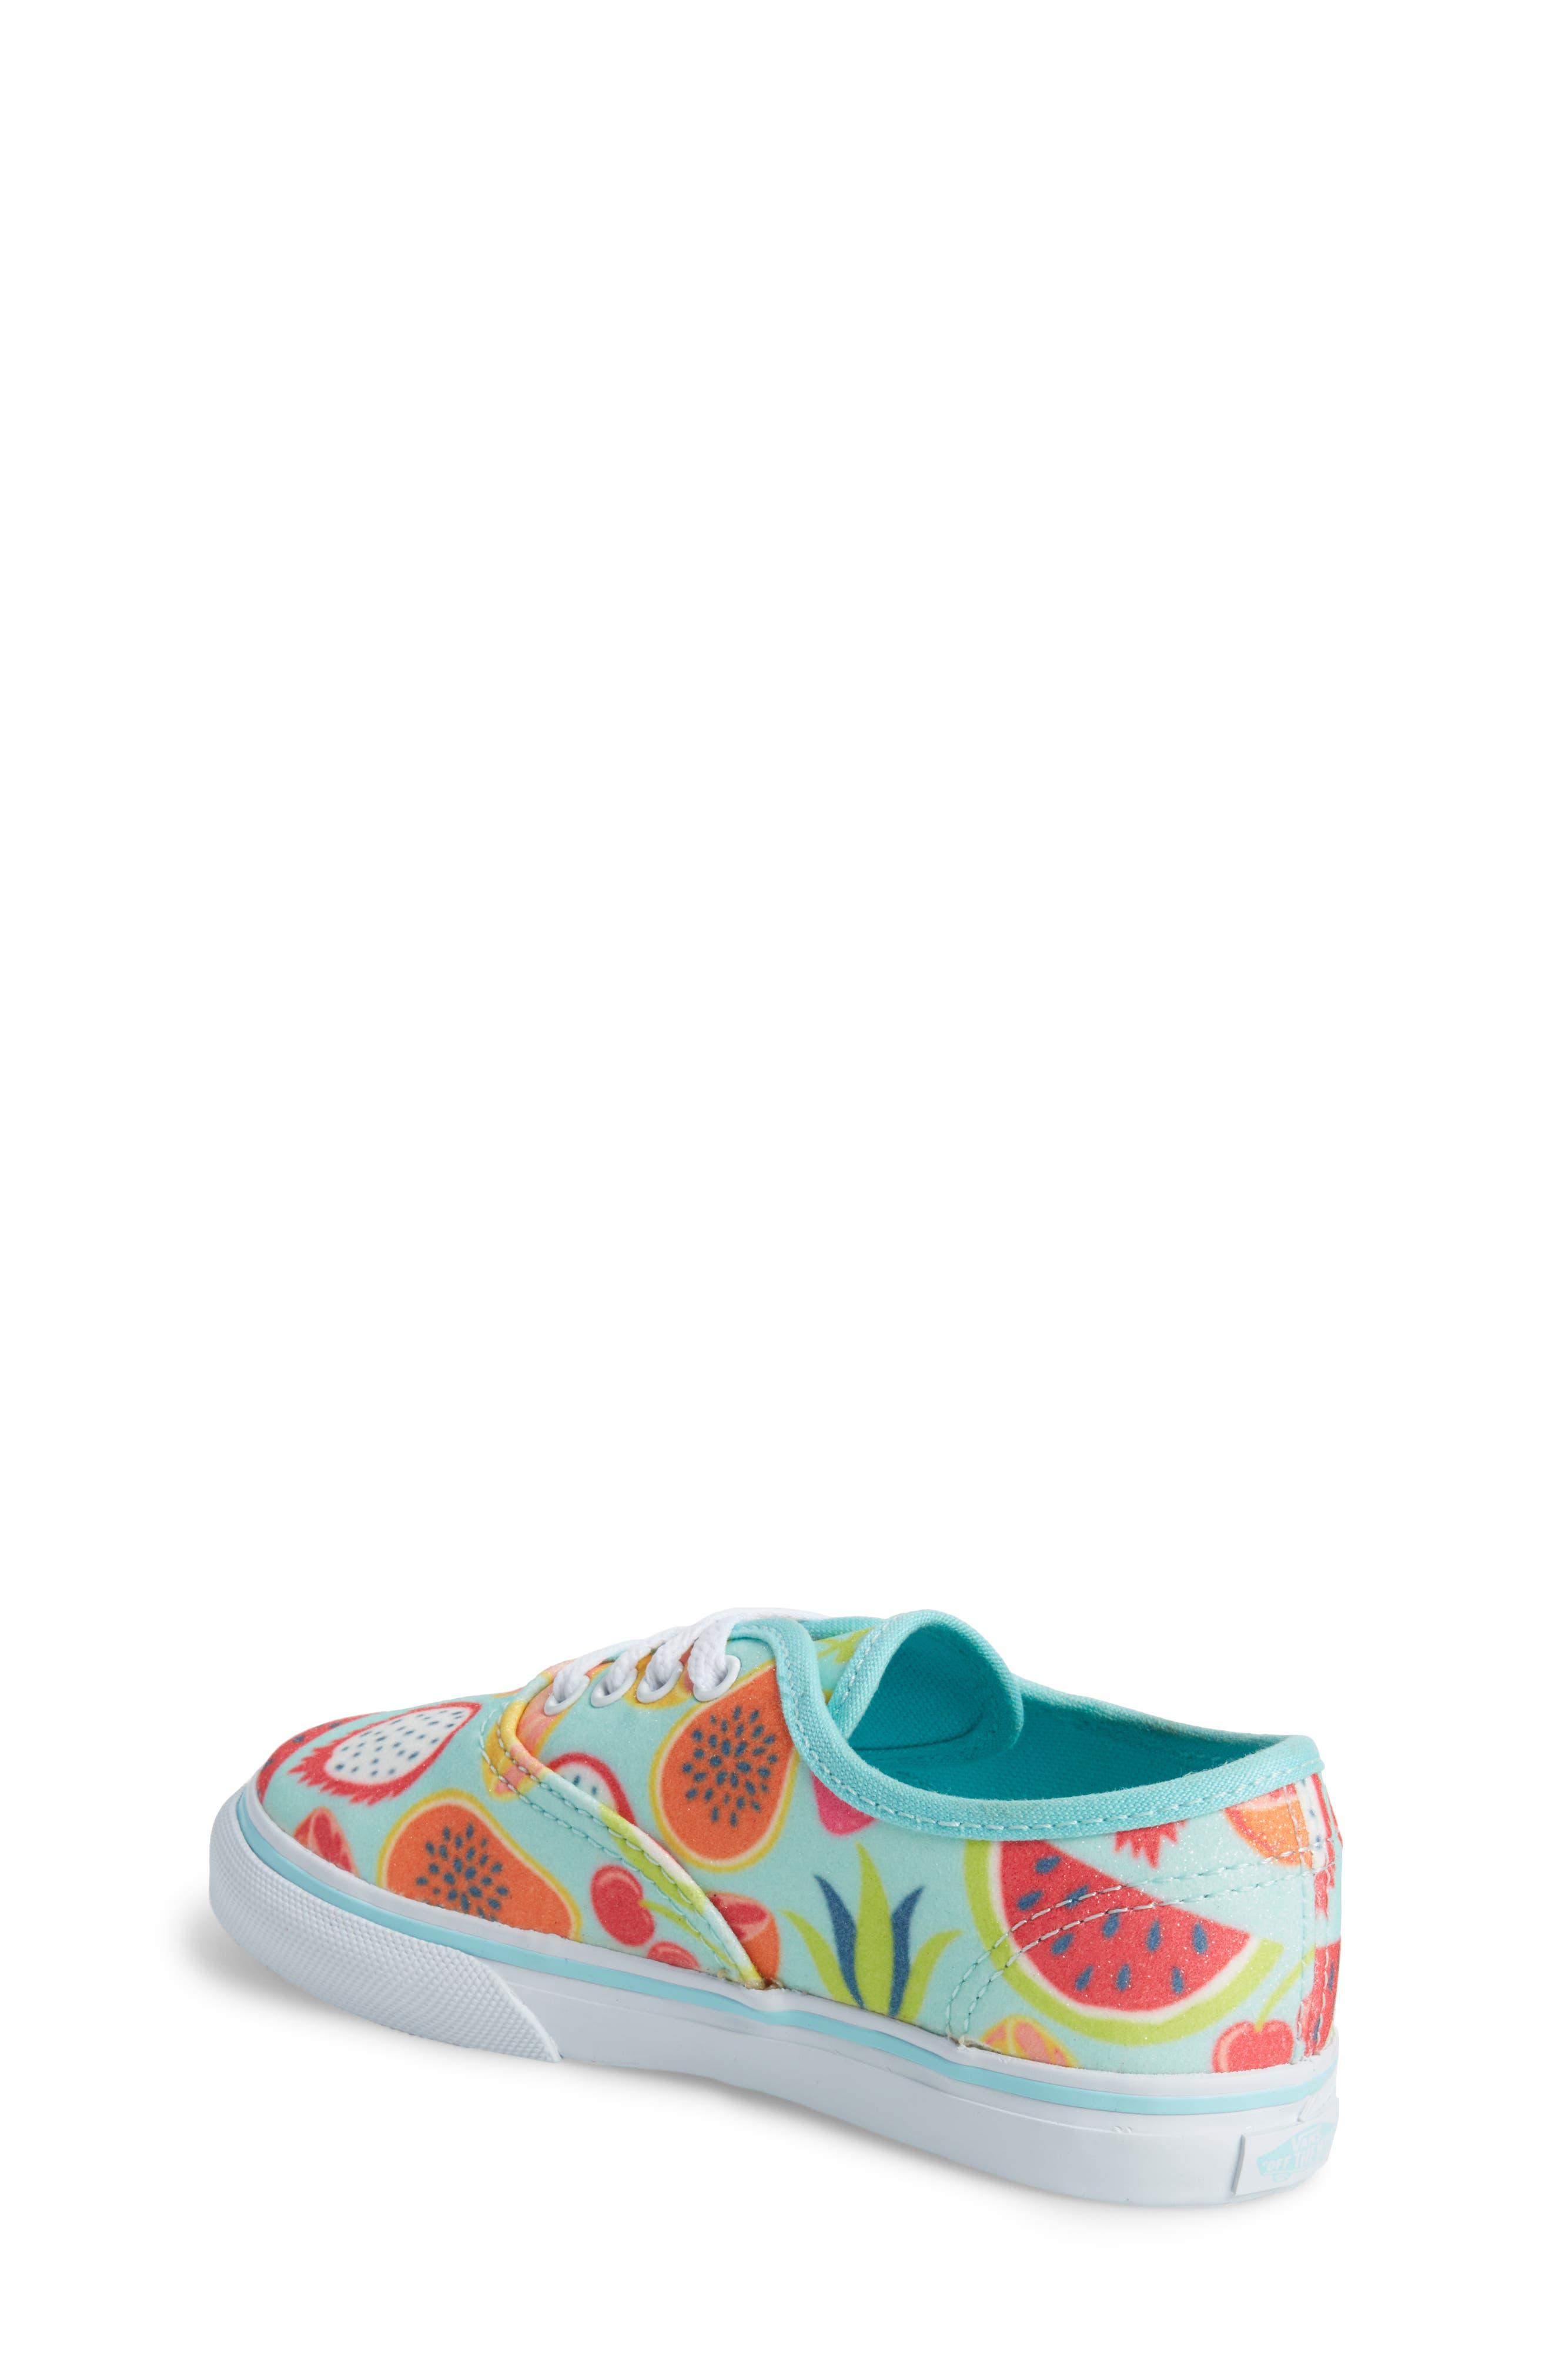 Authentic Glitter Fruits Sneaker,                             Alternate thumbnail 2, color,                             Island Paradise/ Glitter Fruit